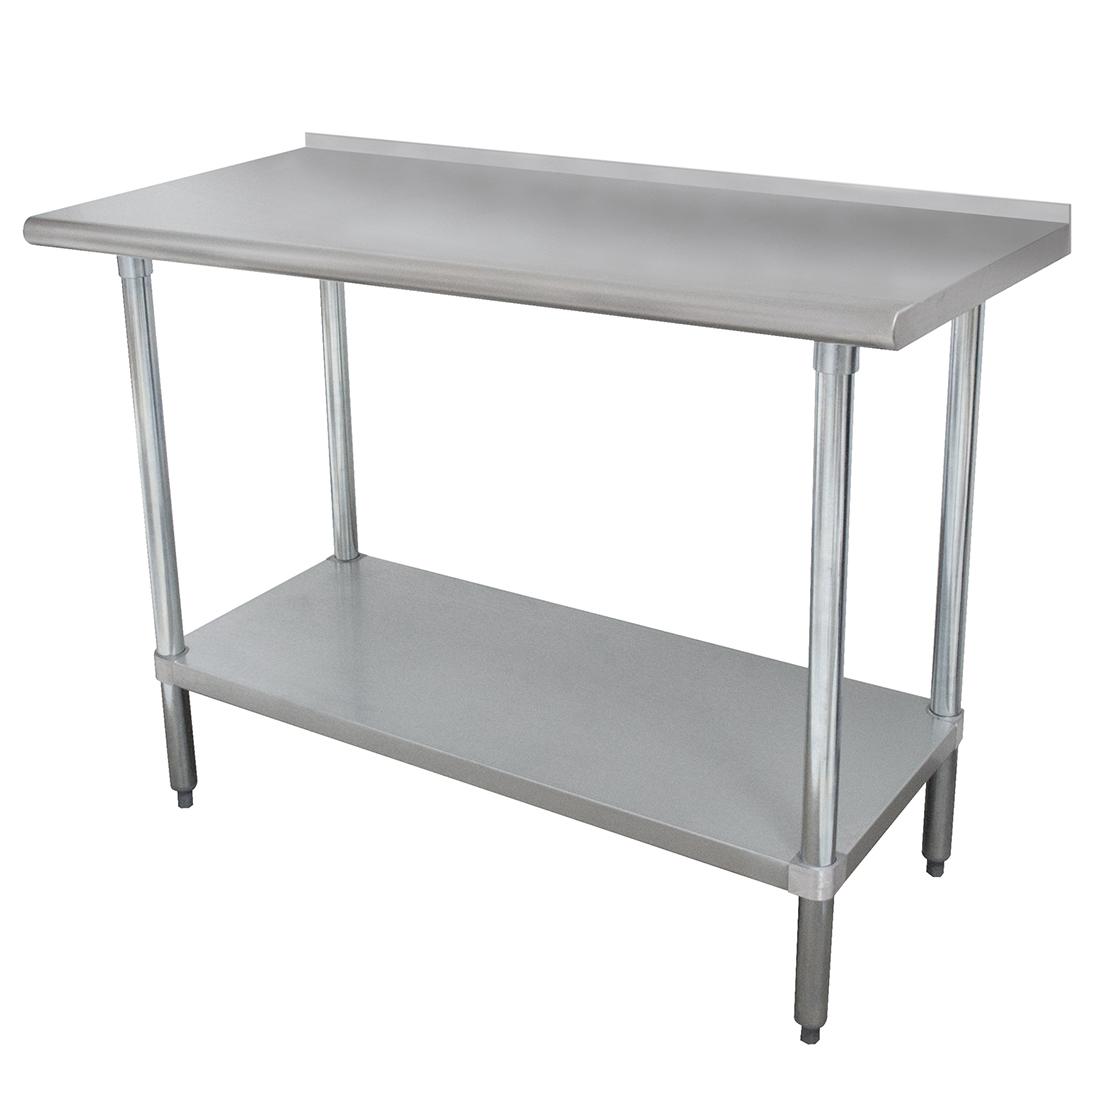 Advance Tabco FAG-306 work table,  63